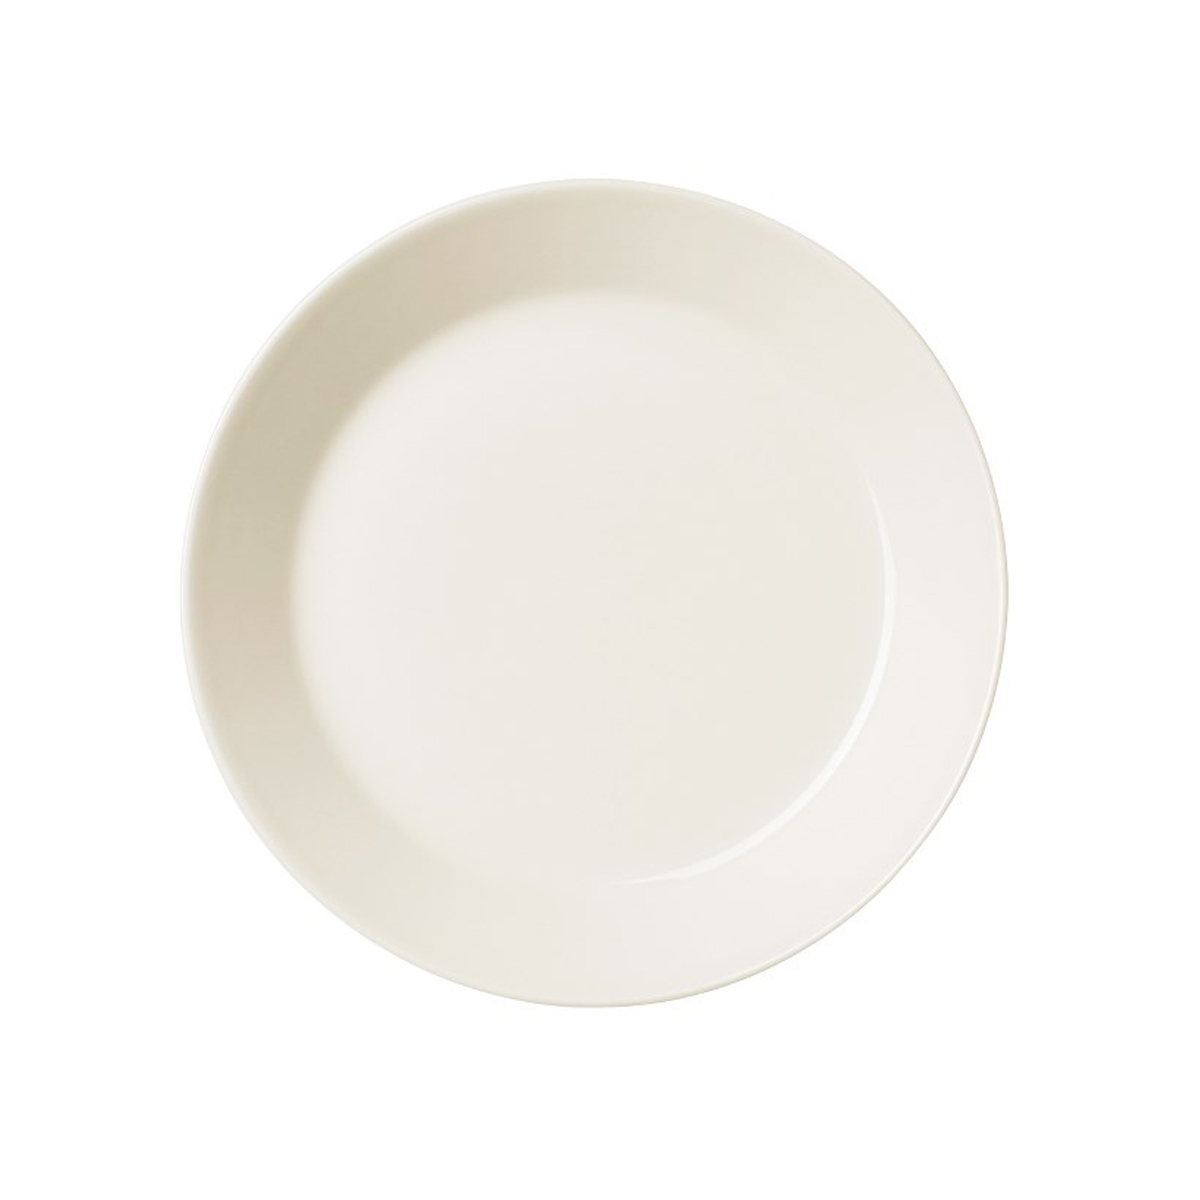 Teema_plate_17cm_white